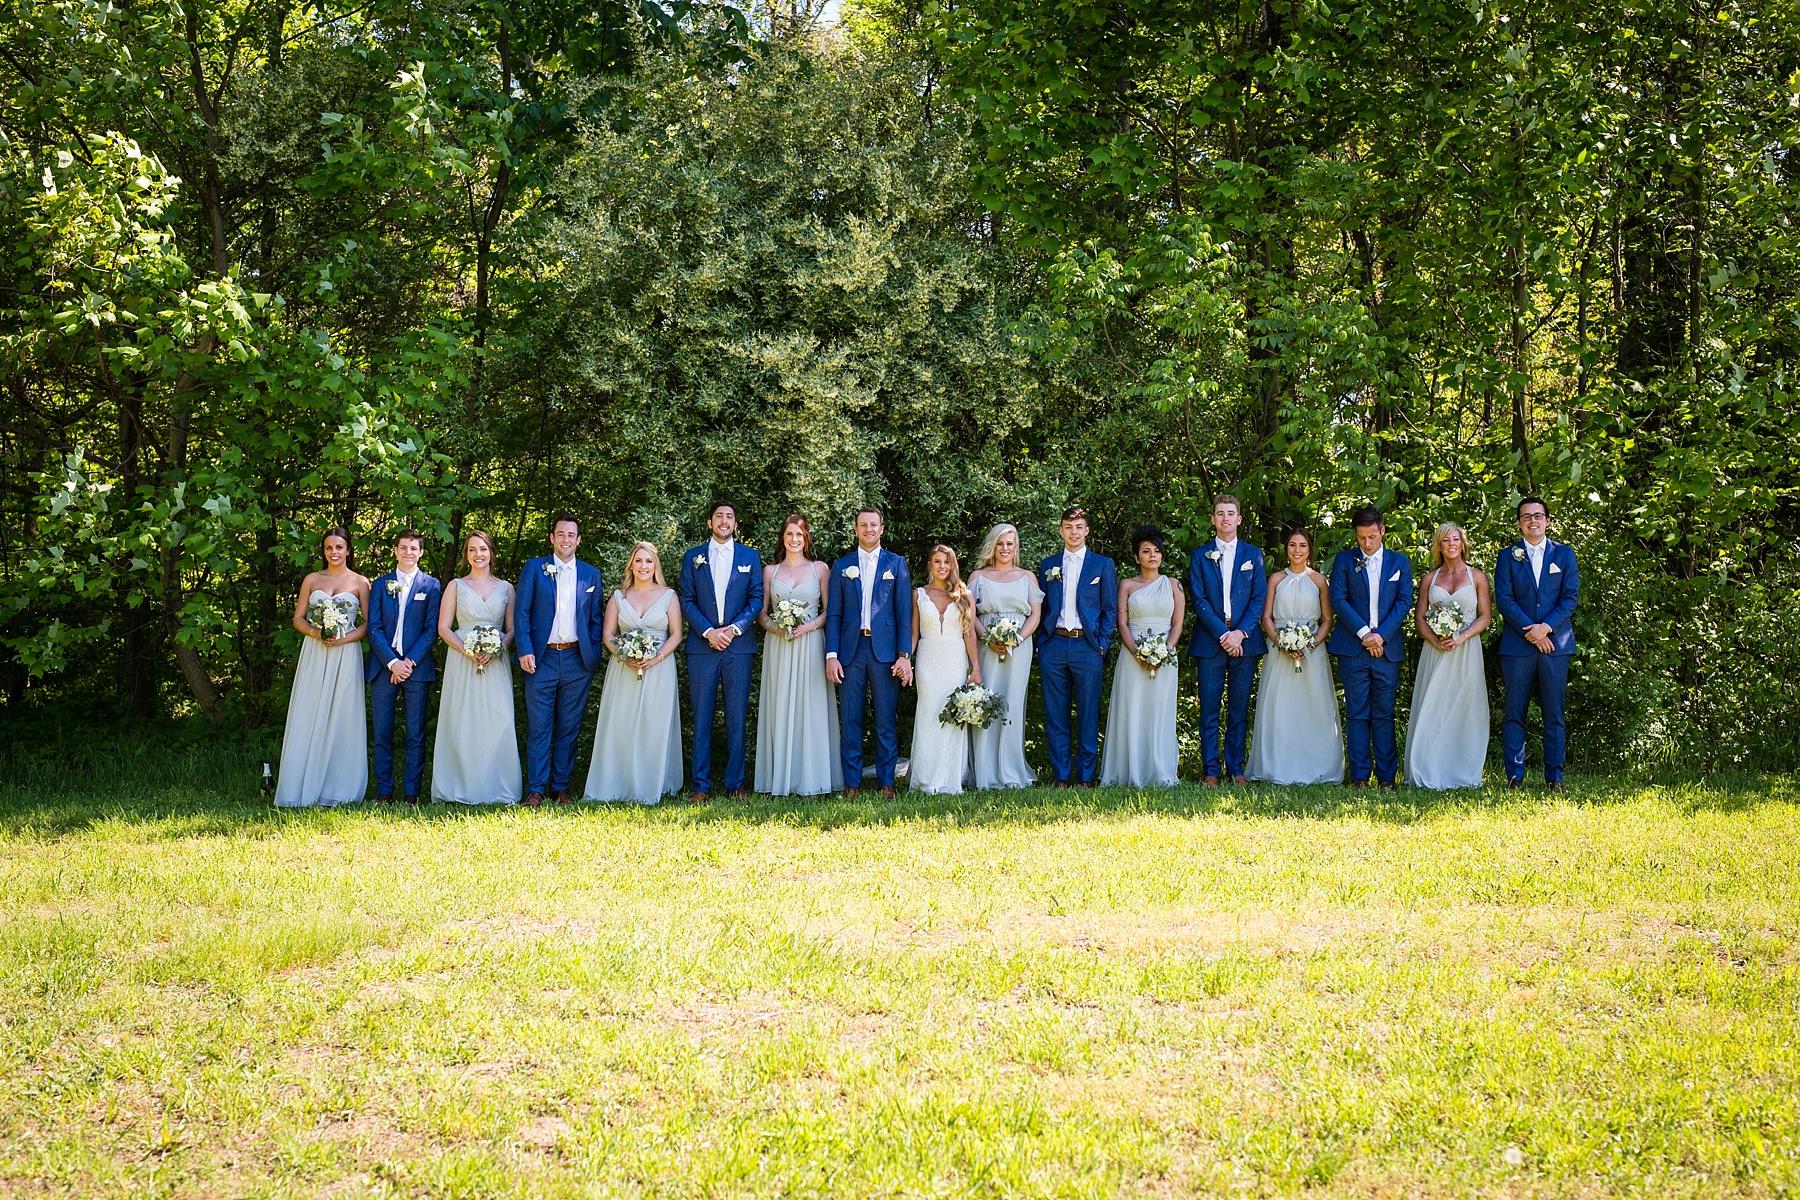 Brandon_Shafer_Photography_Kara_Doug_12_corners_Wedding_Benton_Harbor_0048.jpg